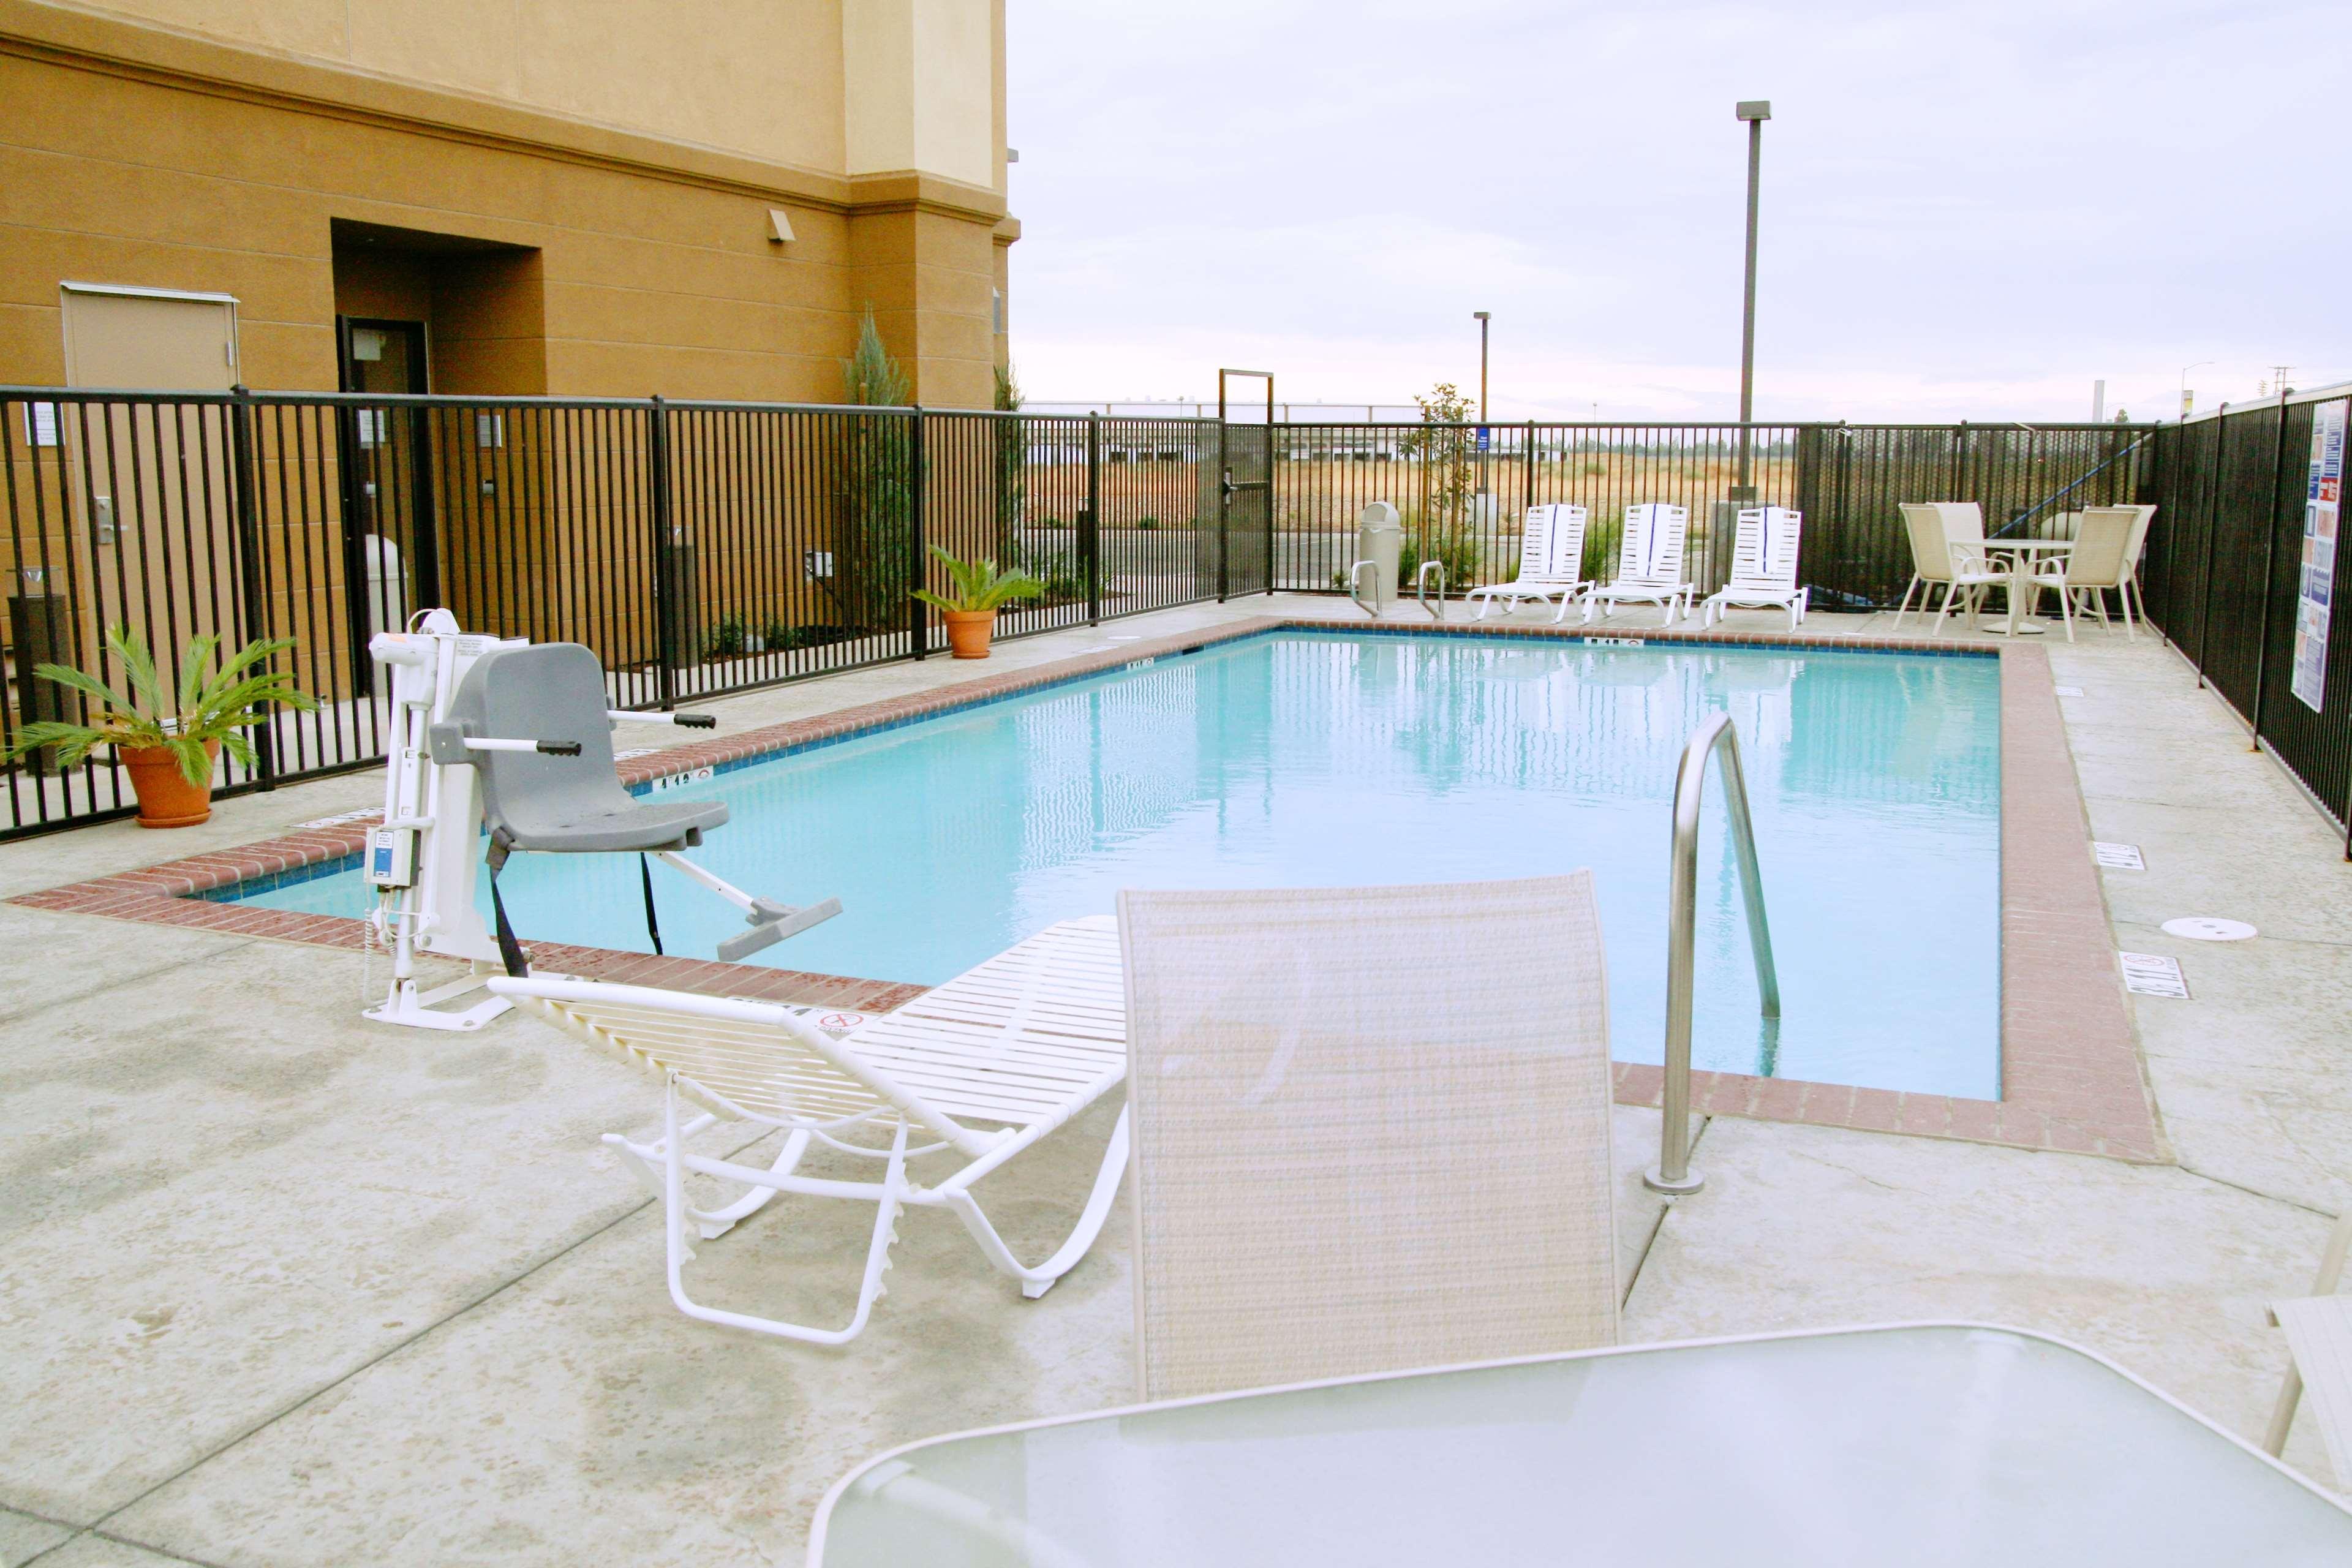 Hampton Inn & Suites Madera image 5